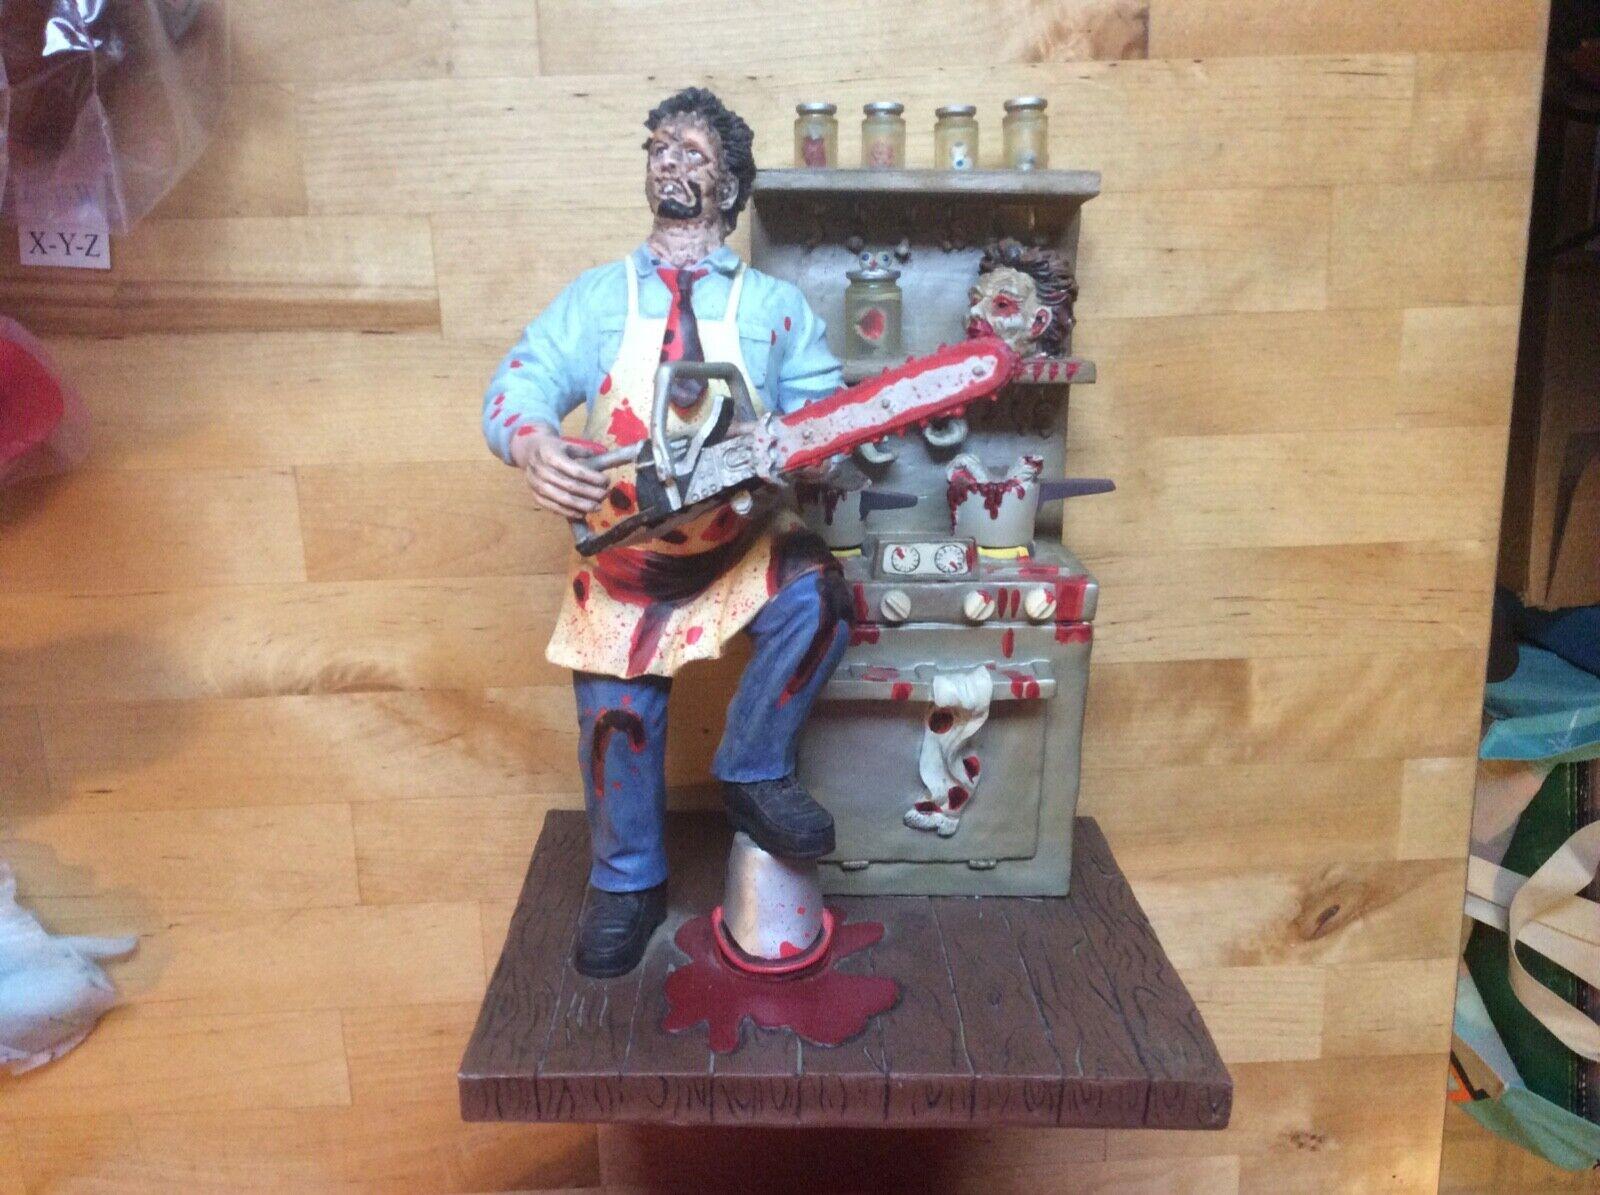 Texas Chainsaw Massacre LeatherFace Diorama 2001 complete w  box Rare statue